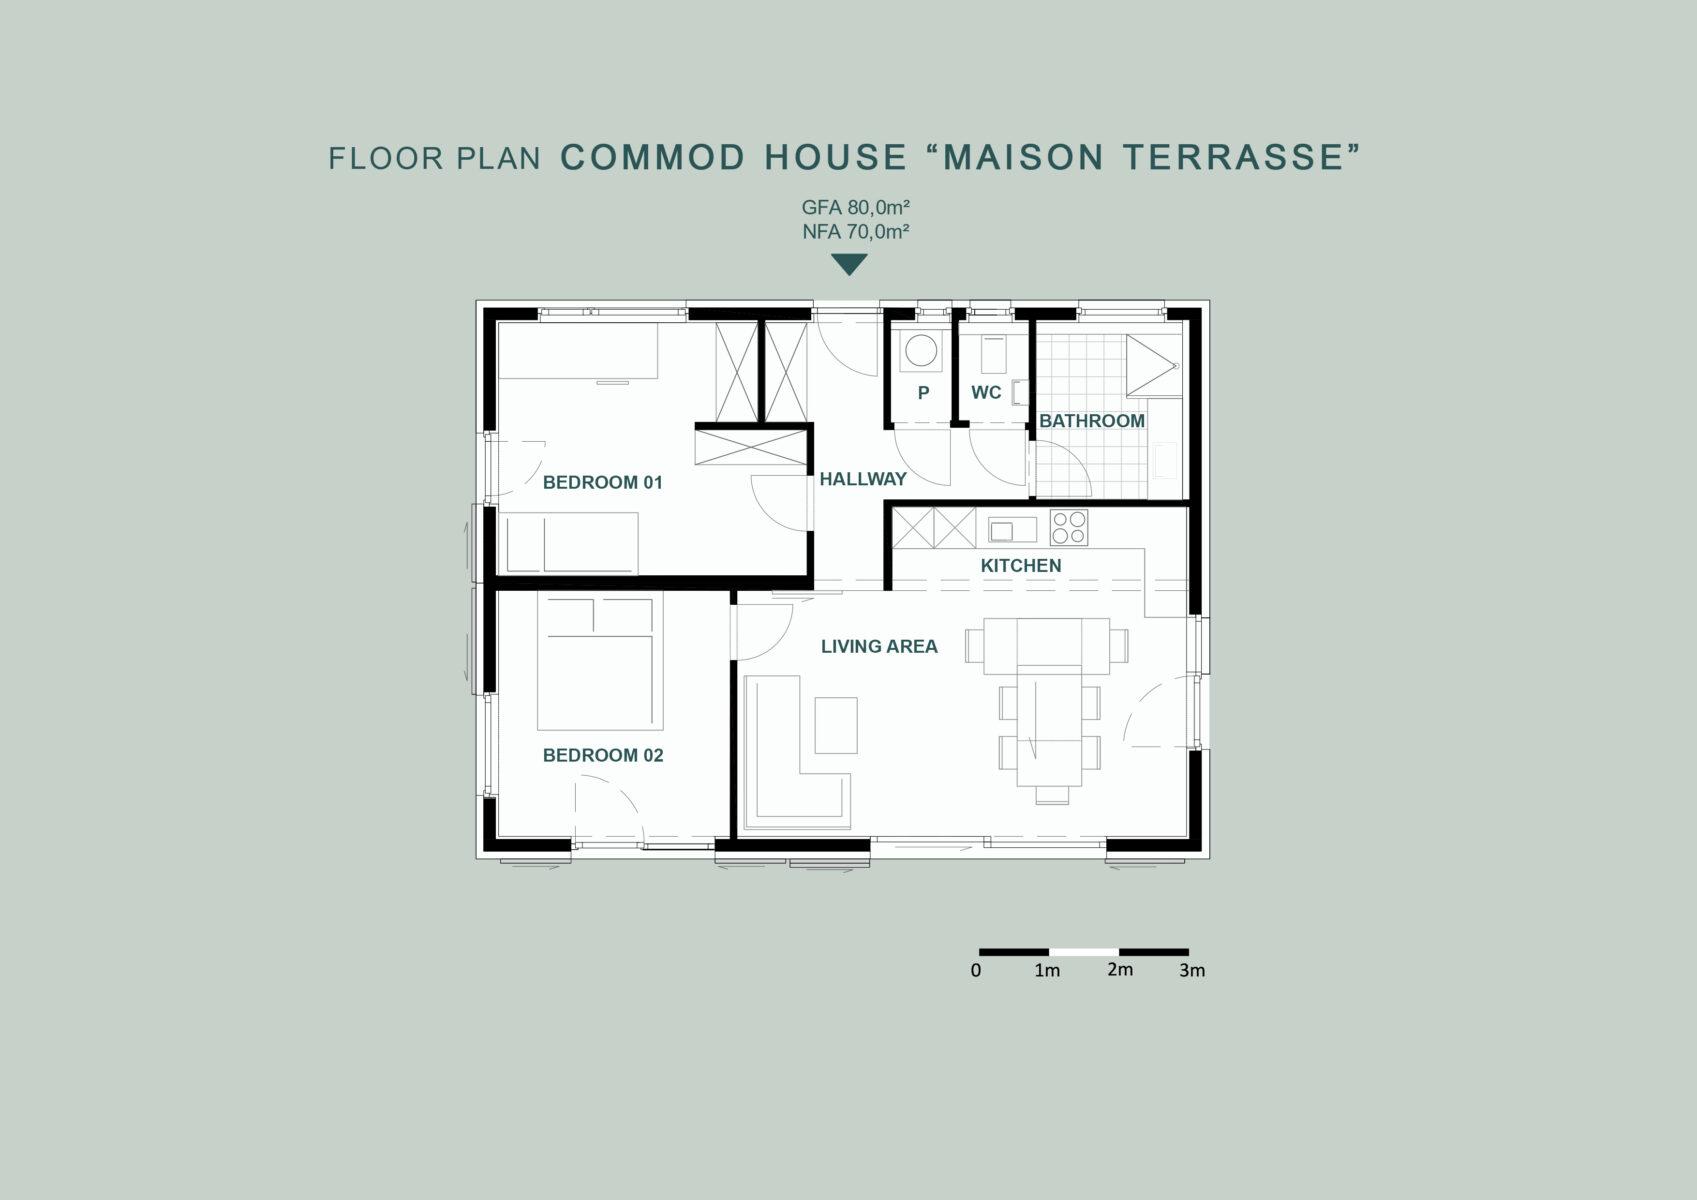 "COMMOD HOUSE ""MAISON TERRASSE"" 80m² GFA"